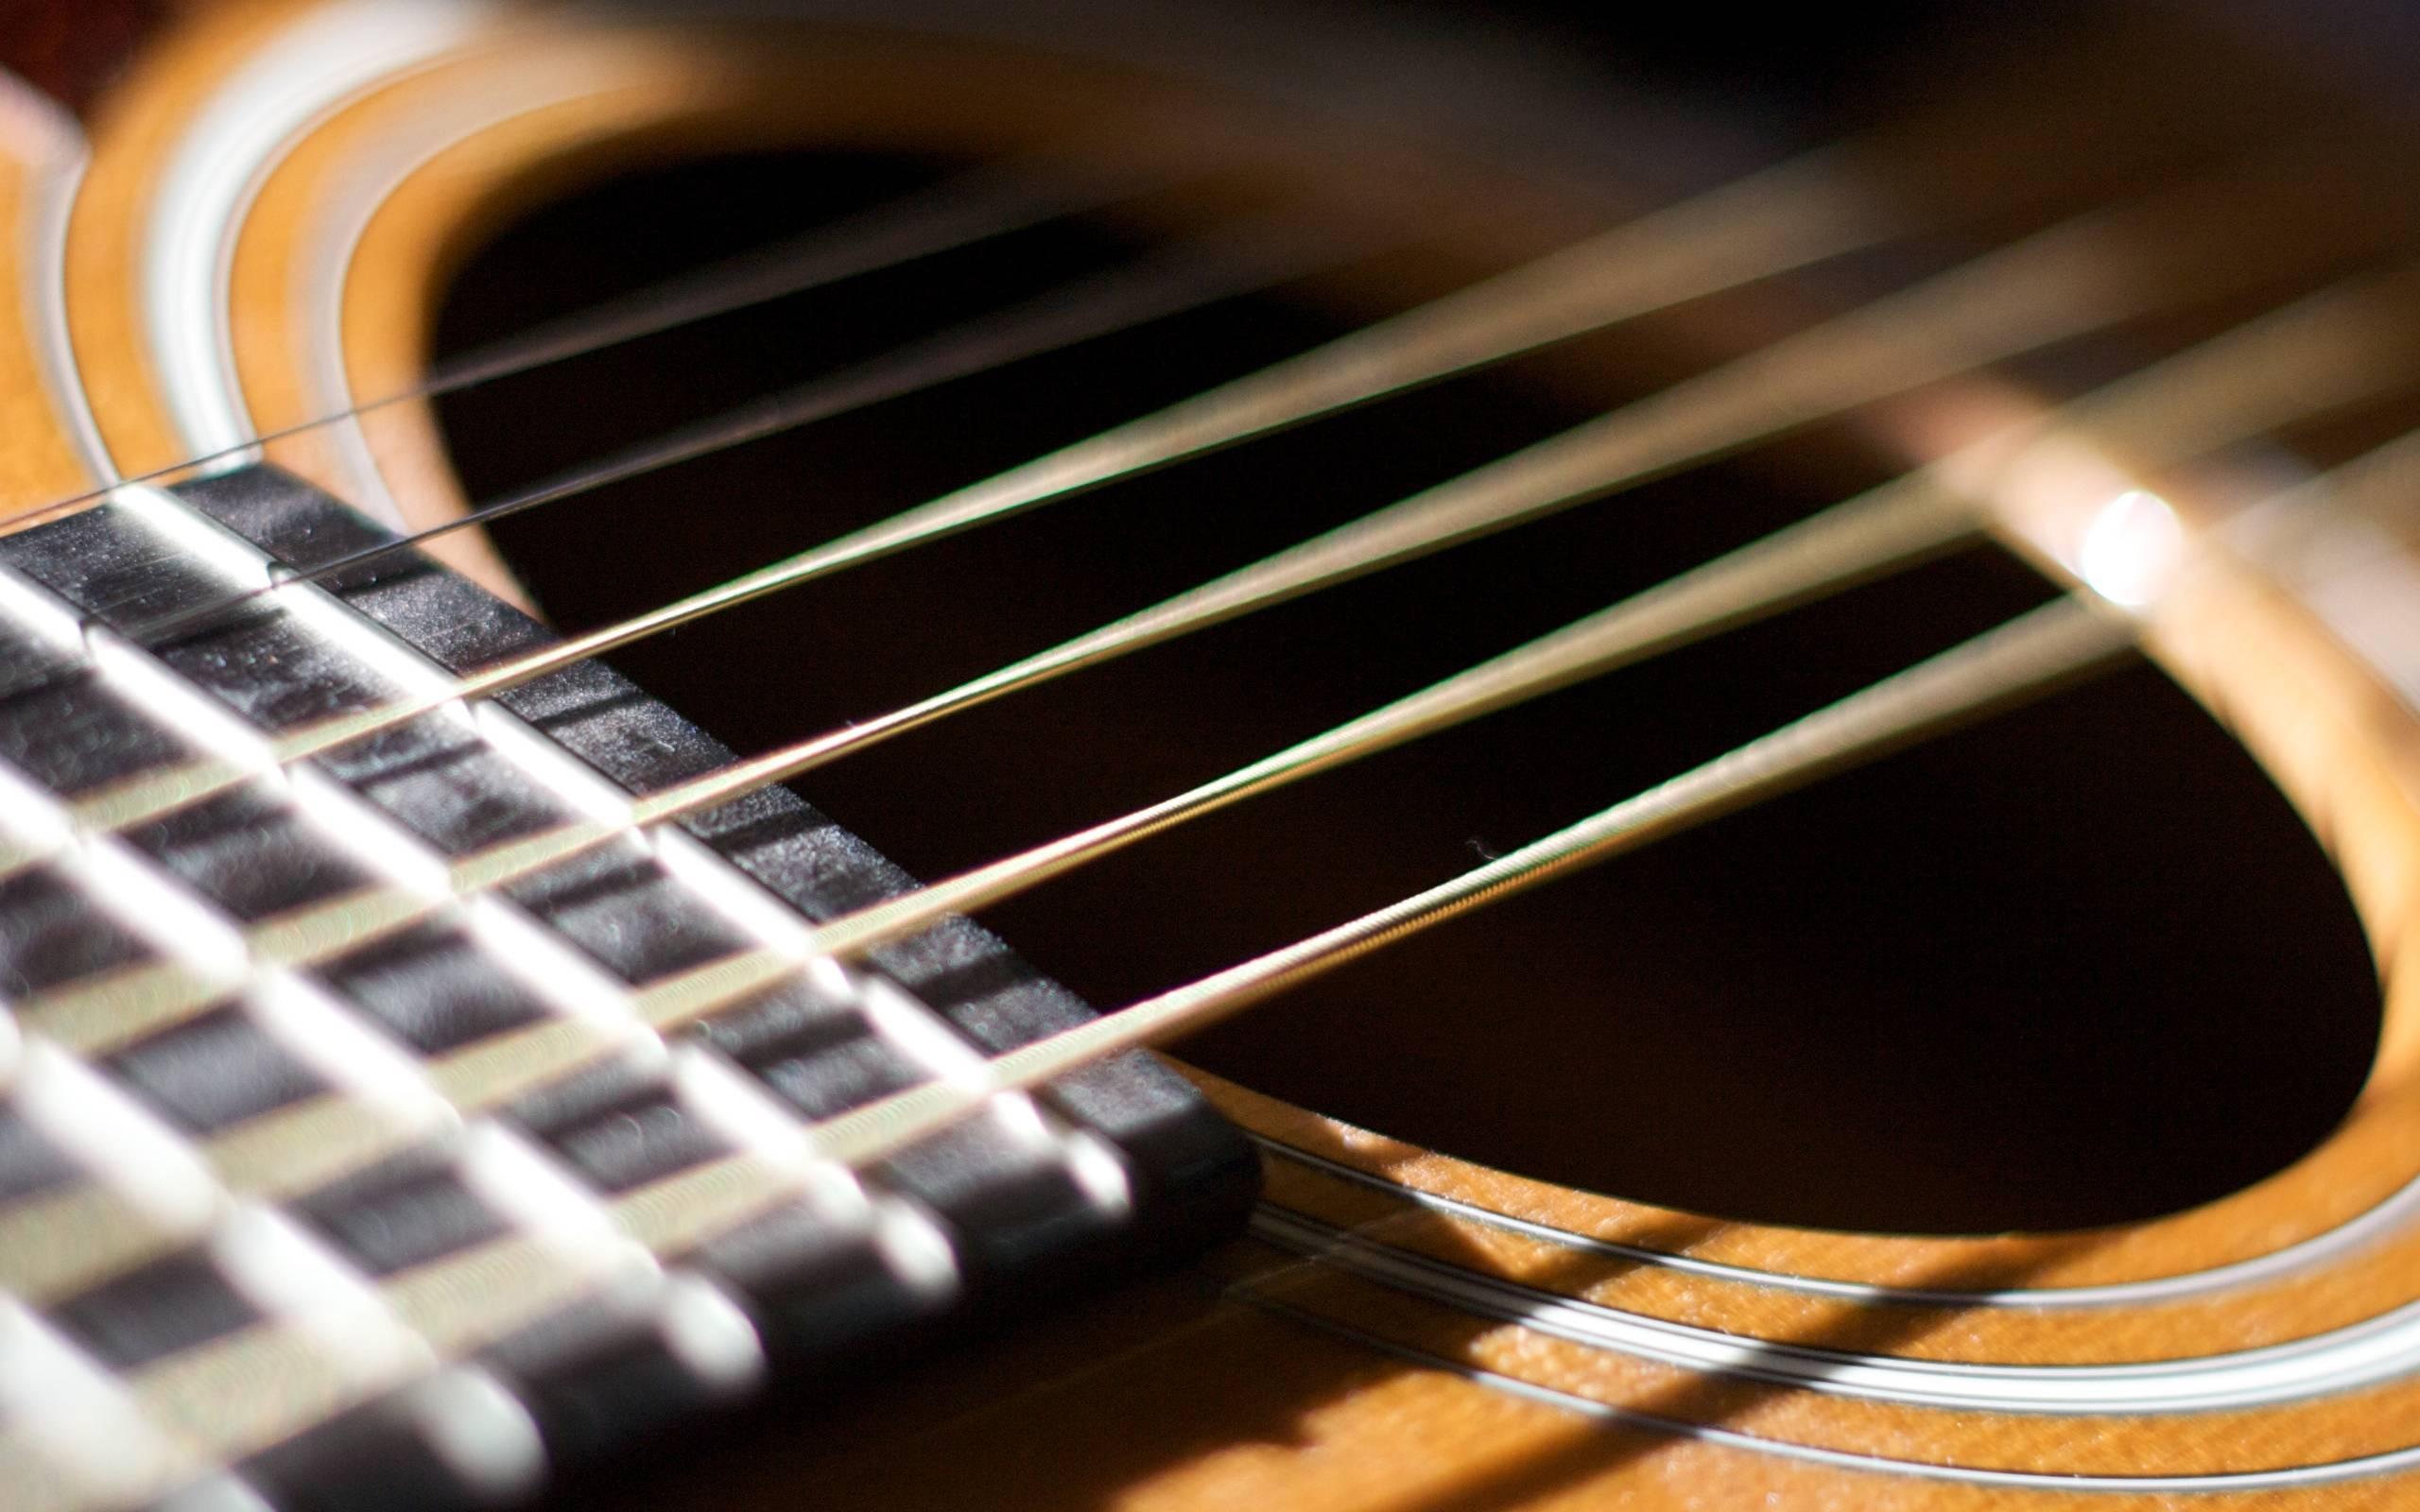 Electric Guitar Wallpapers 1080p - Wickedsa com